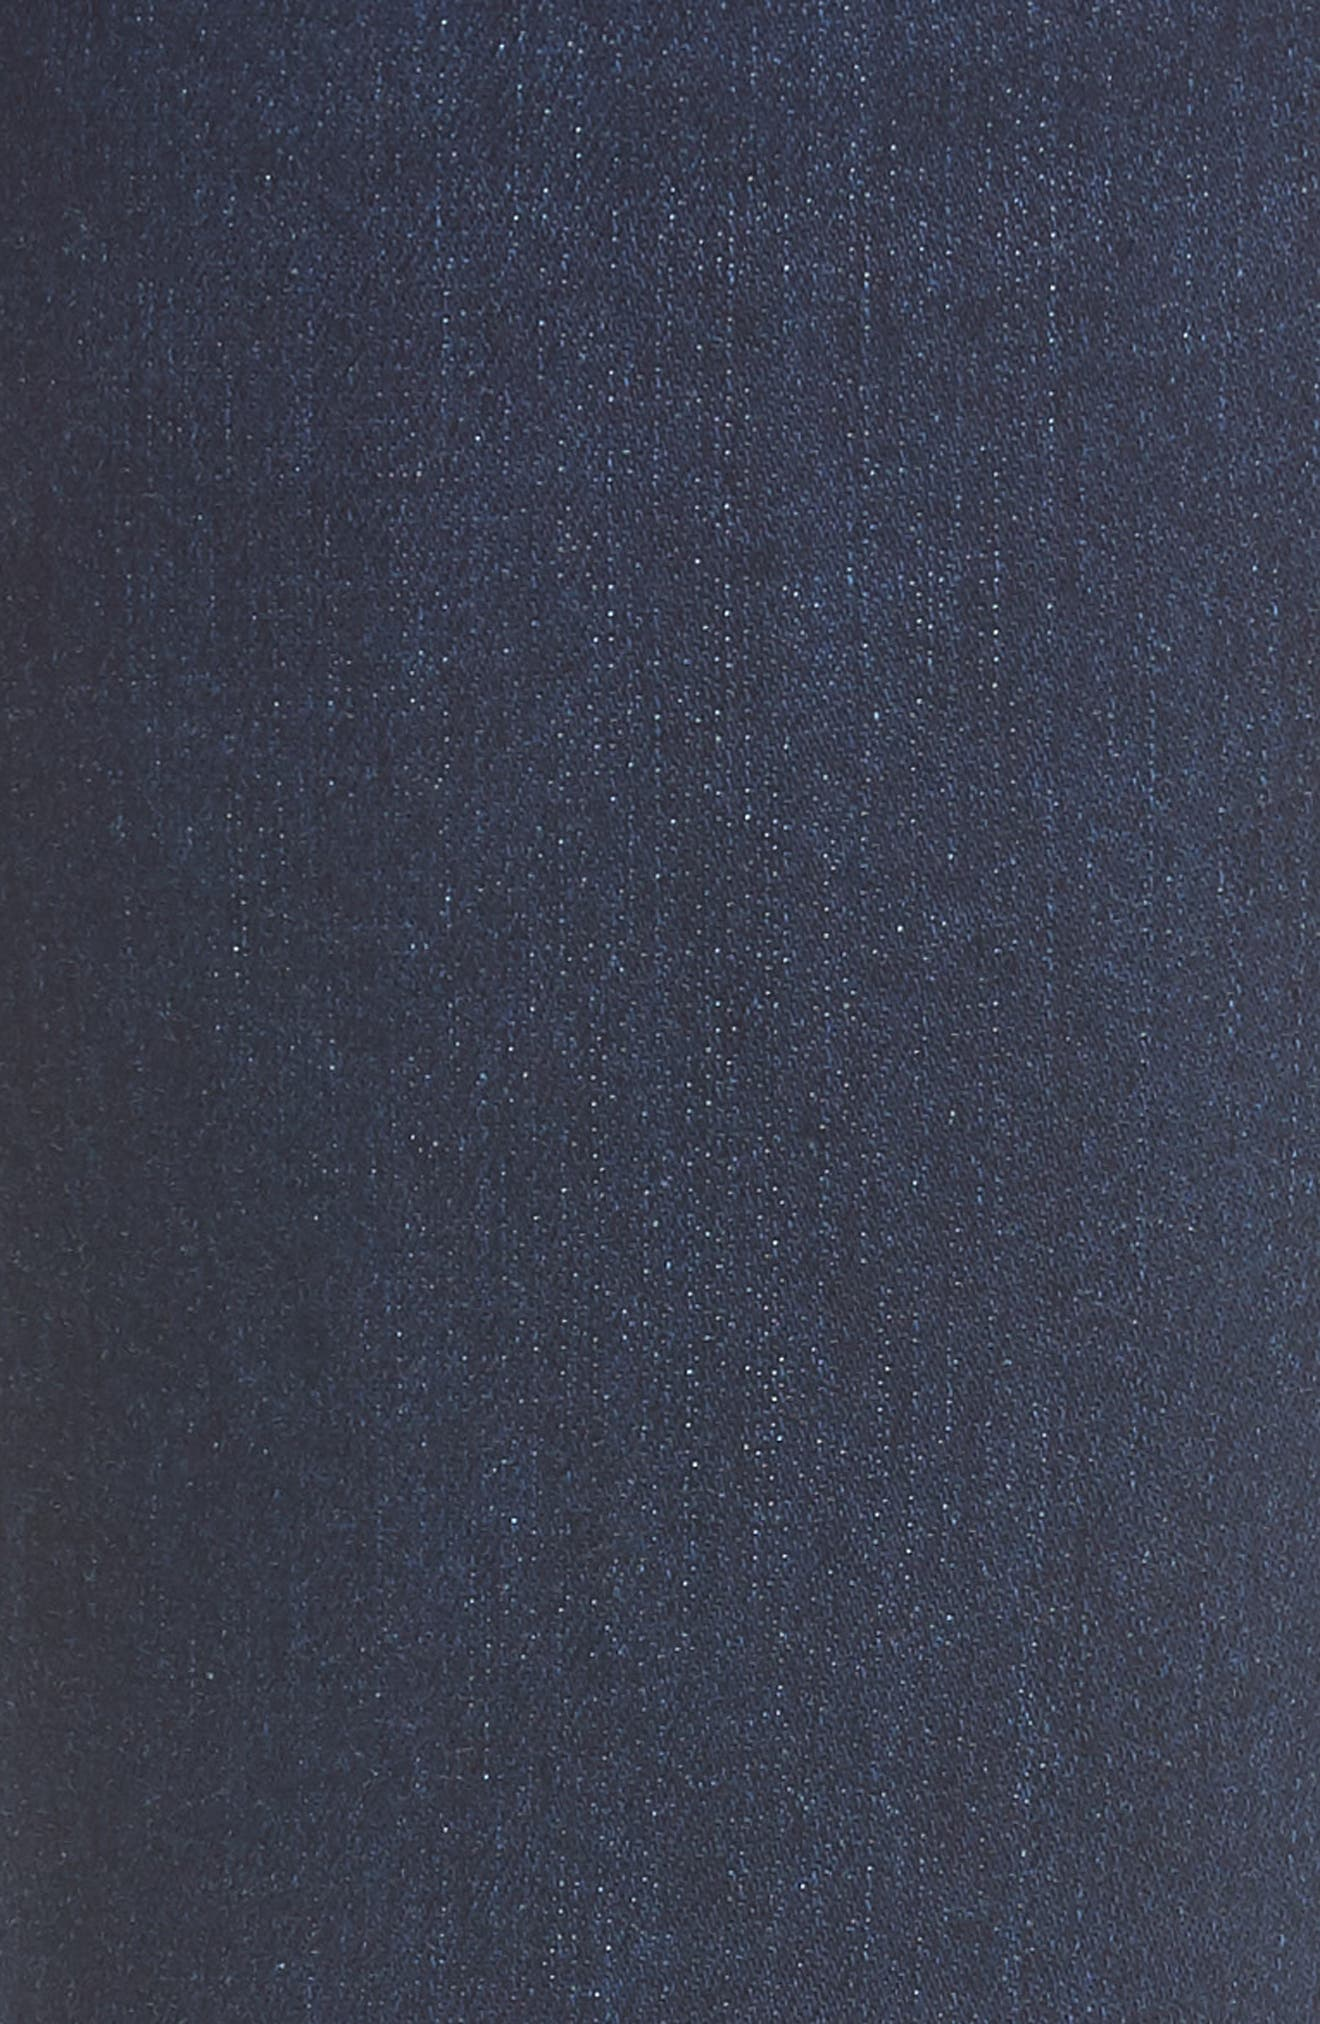 Skyline Skinny Jeans,                             Alternate thumbnail 6, color,                             IDLEWILD